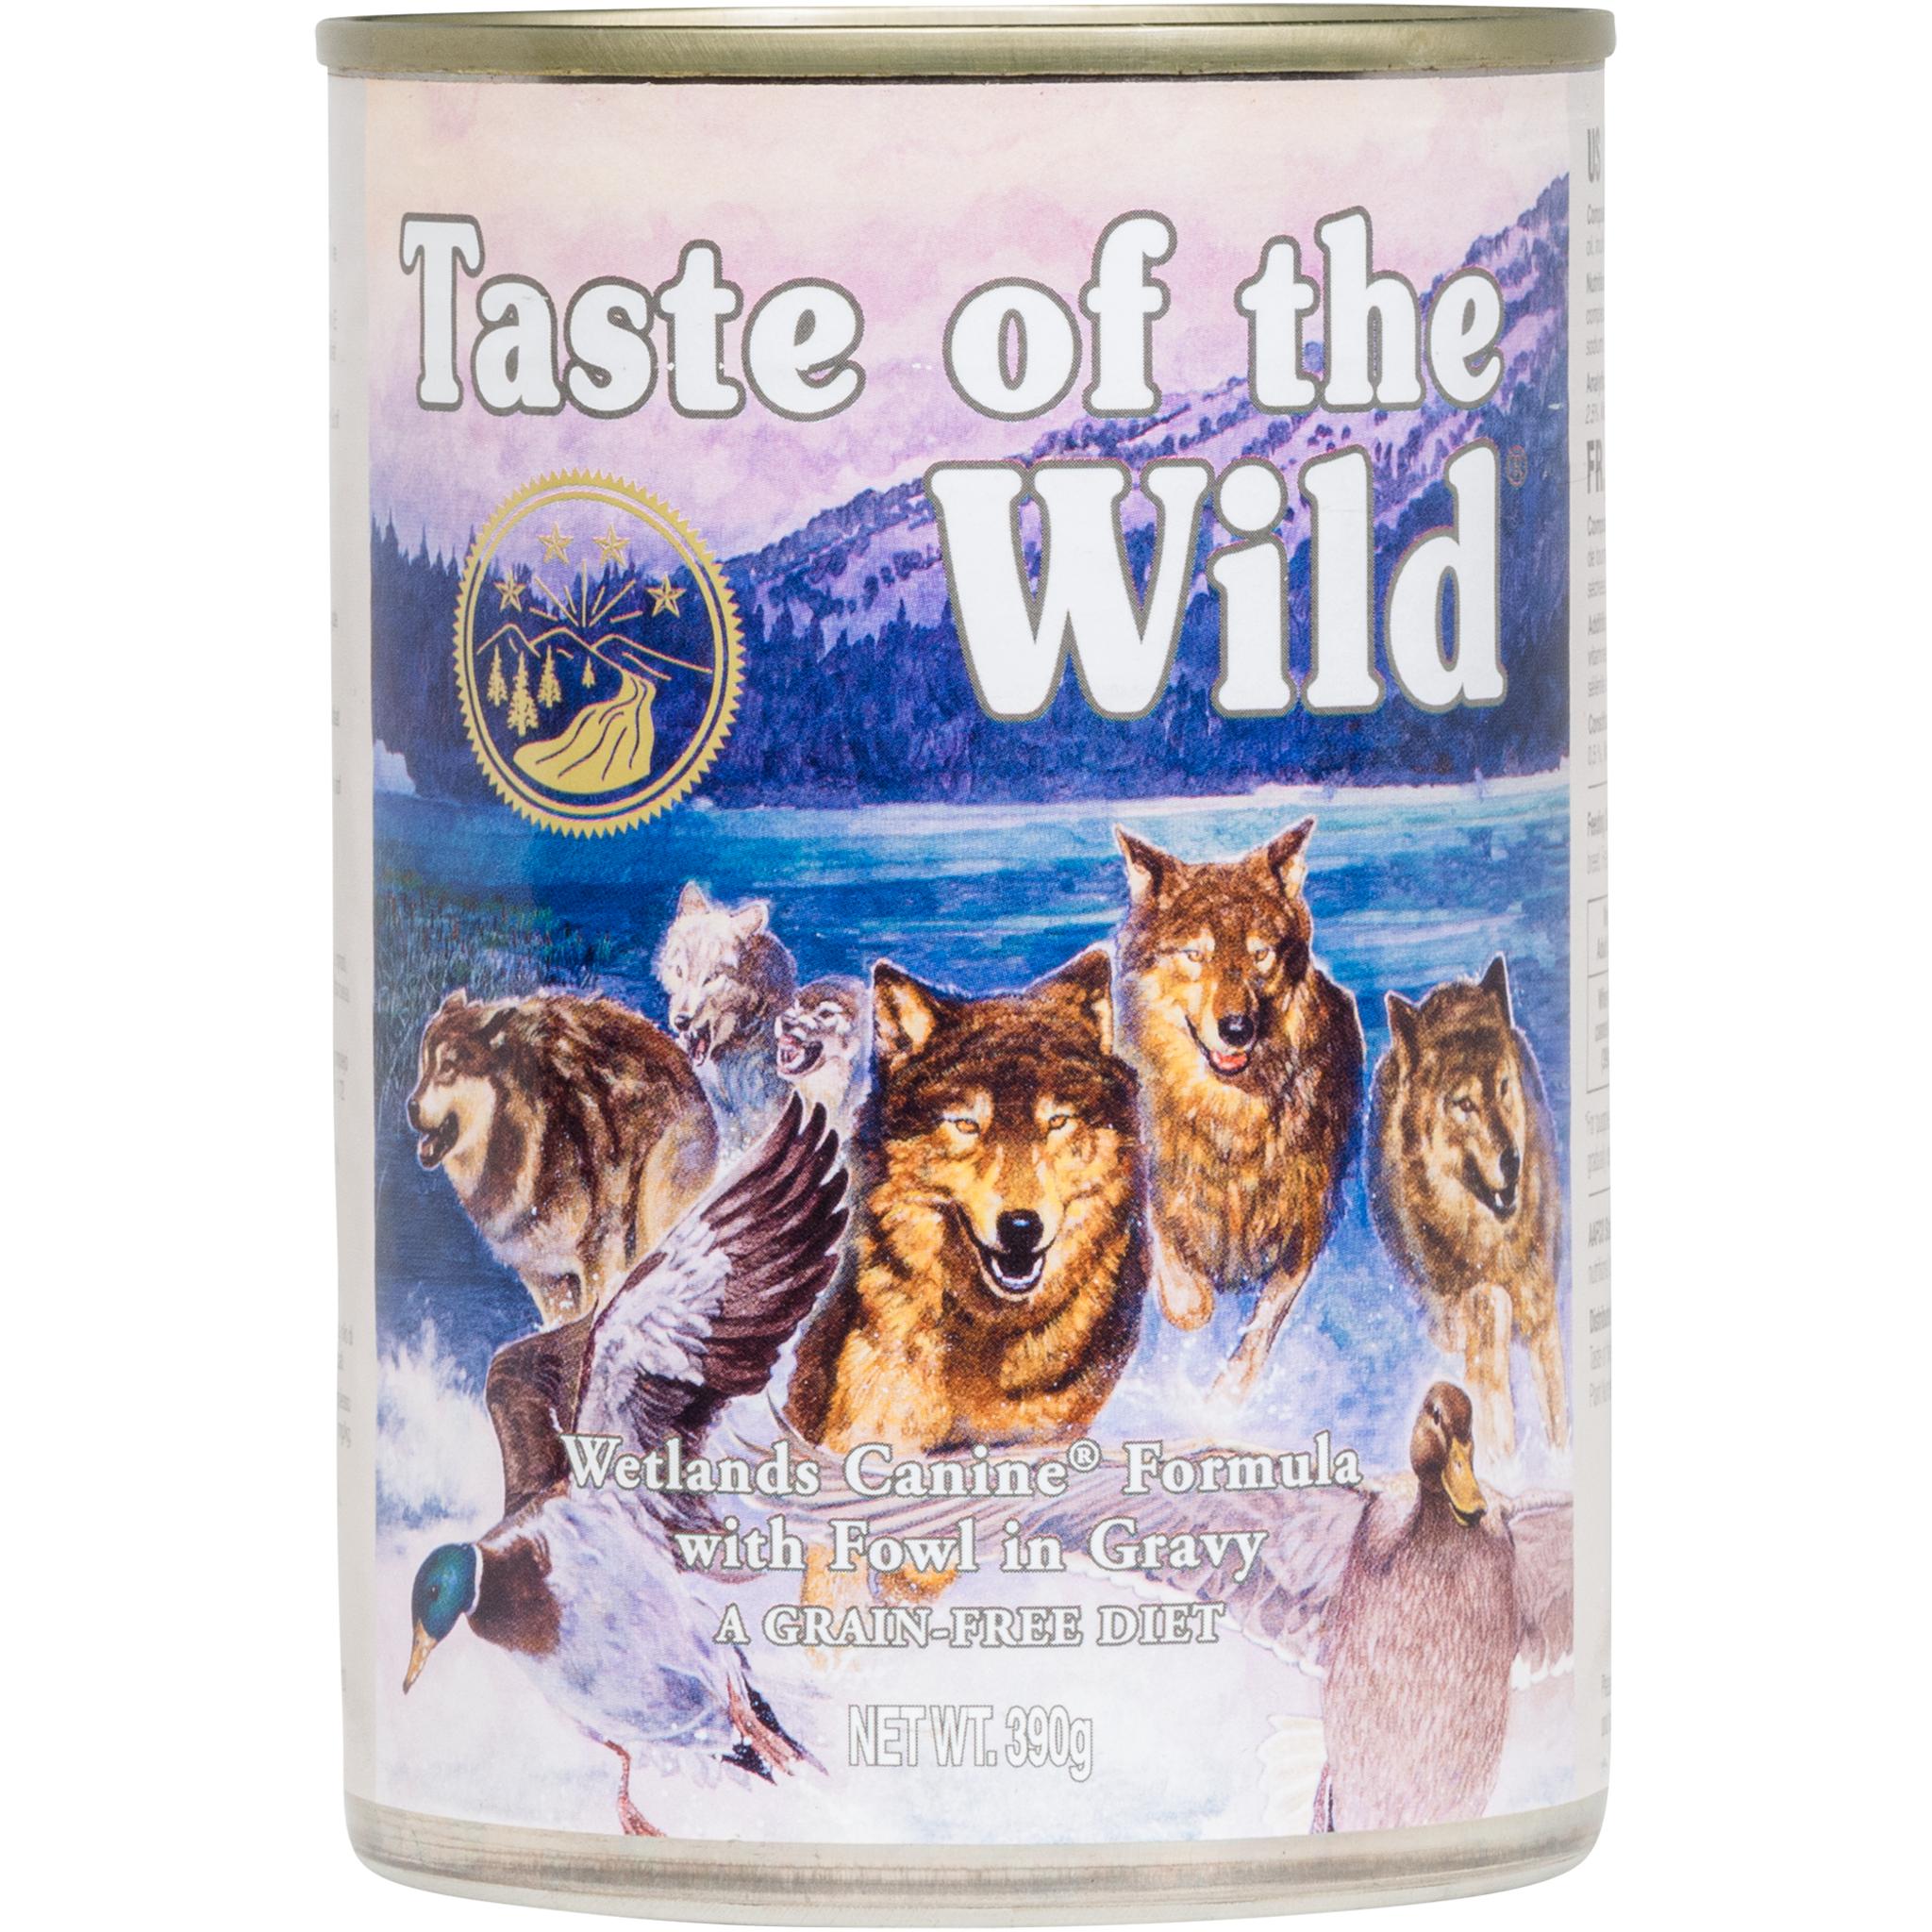 Taste of the Wild Wetlands Duck Cans, hundefòr